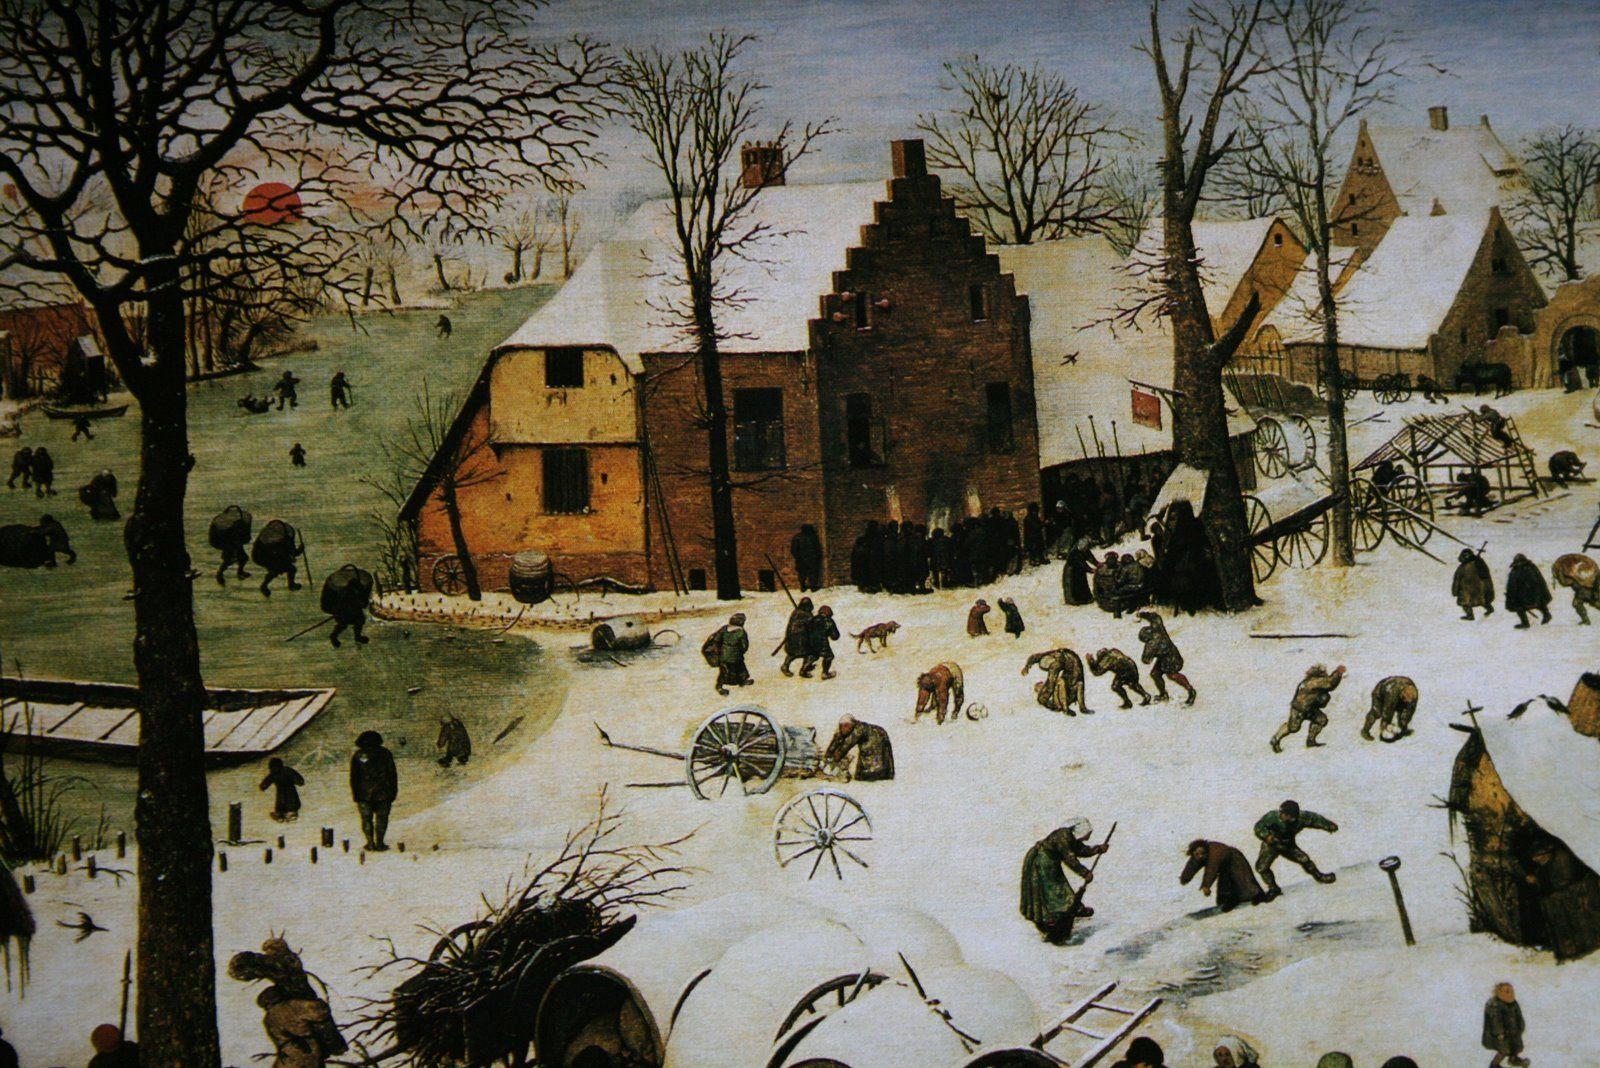 Peter Brueghel 1525-1565  'Recentering El Pueblo'   That Magical Muted Feeling of Snow...